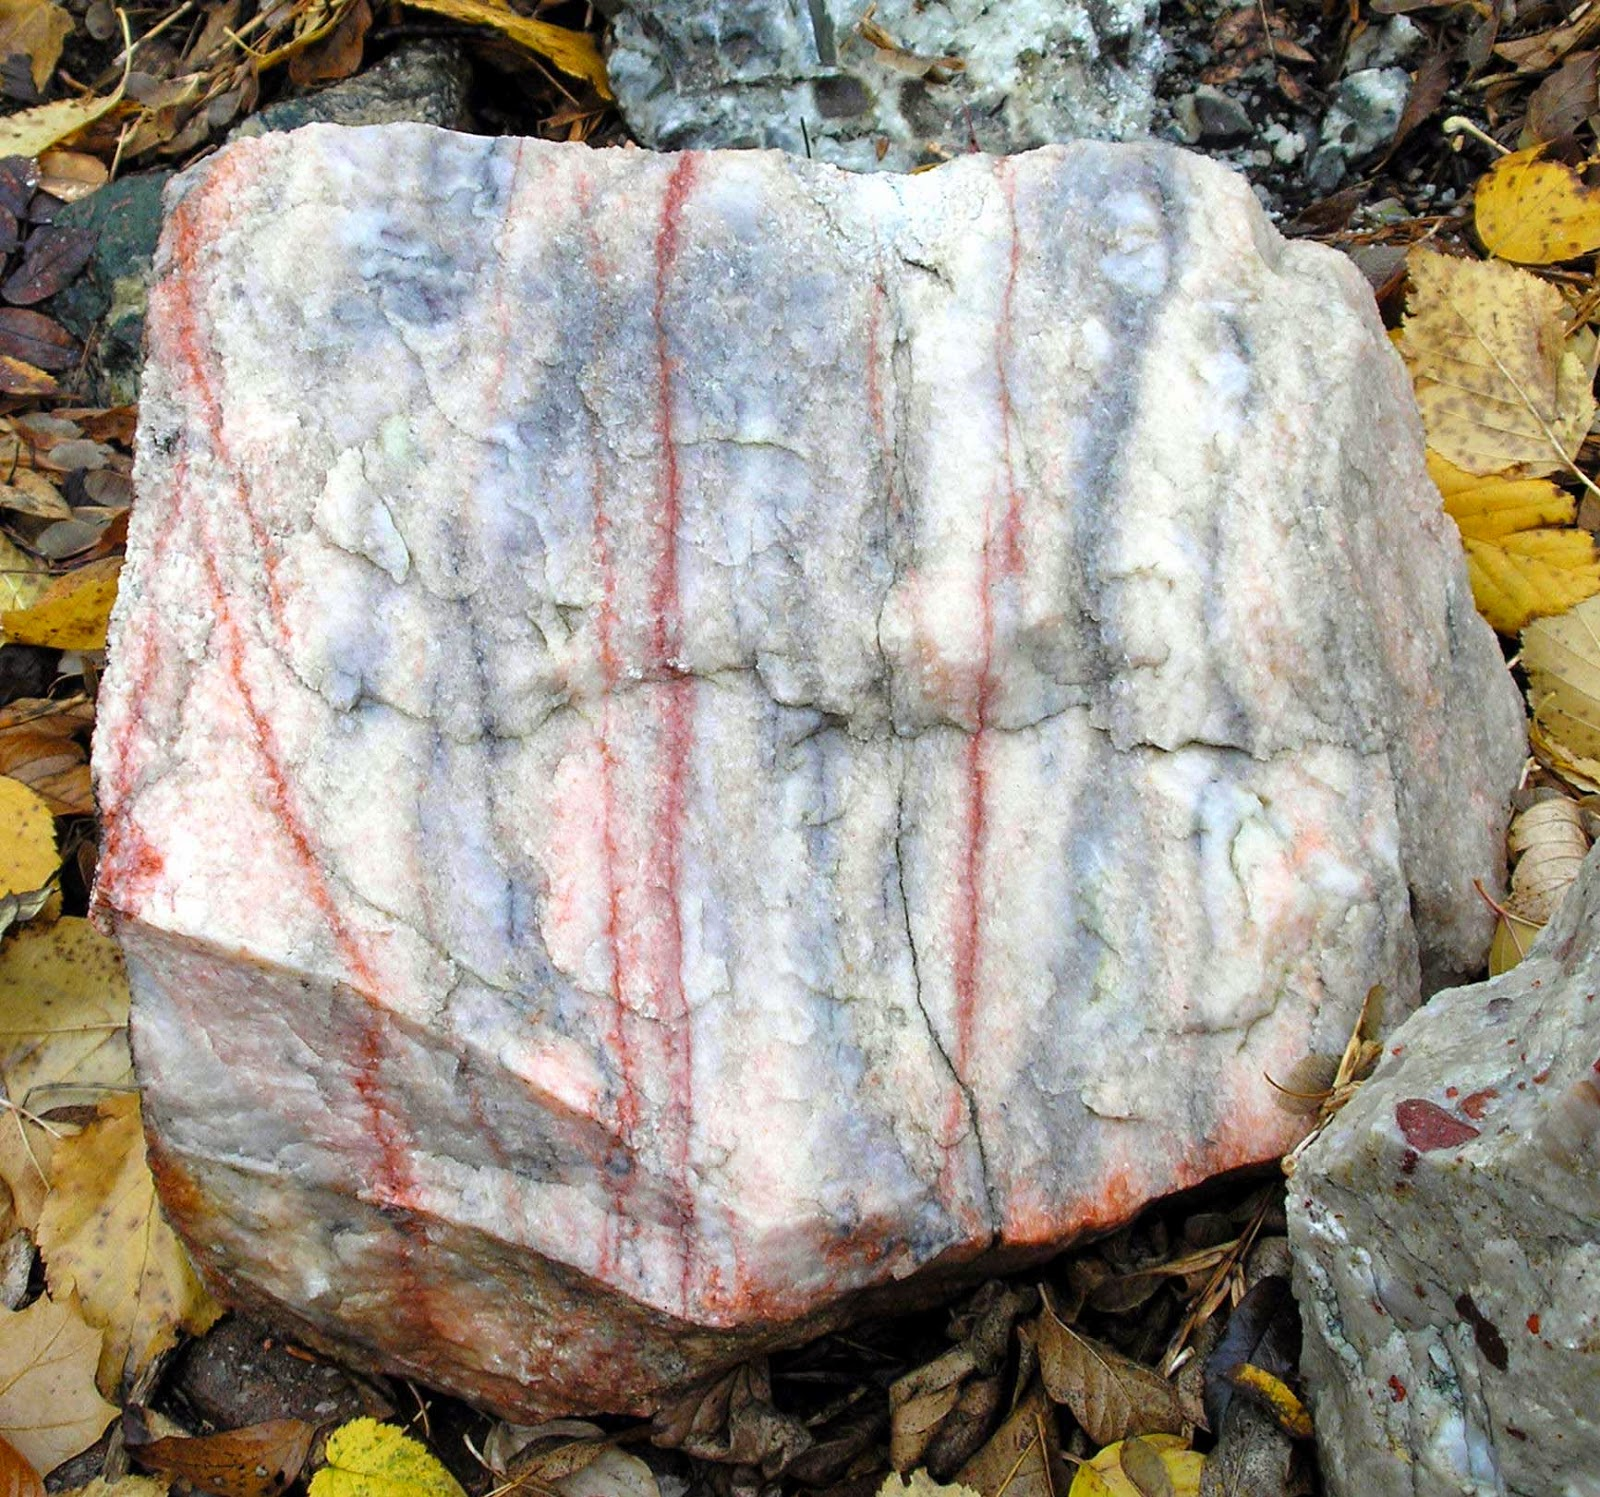 Marble Metamorphic Rock : Marble learning geology